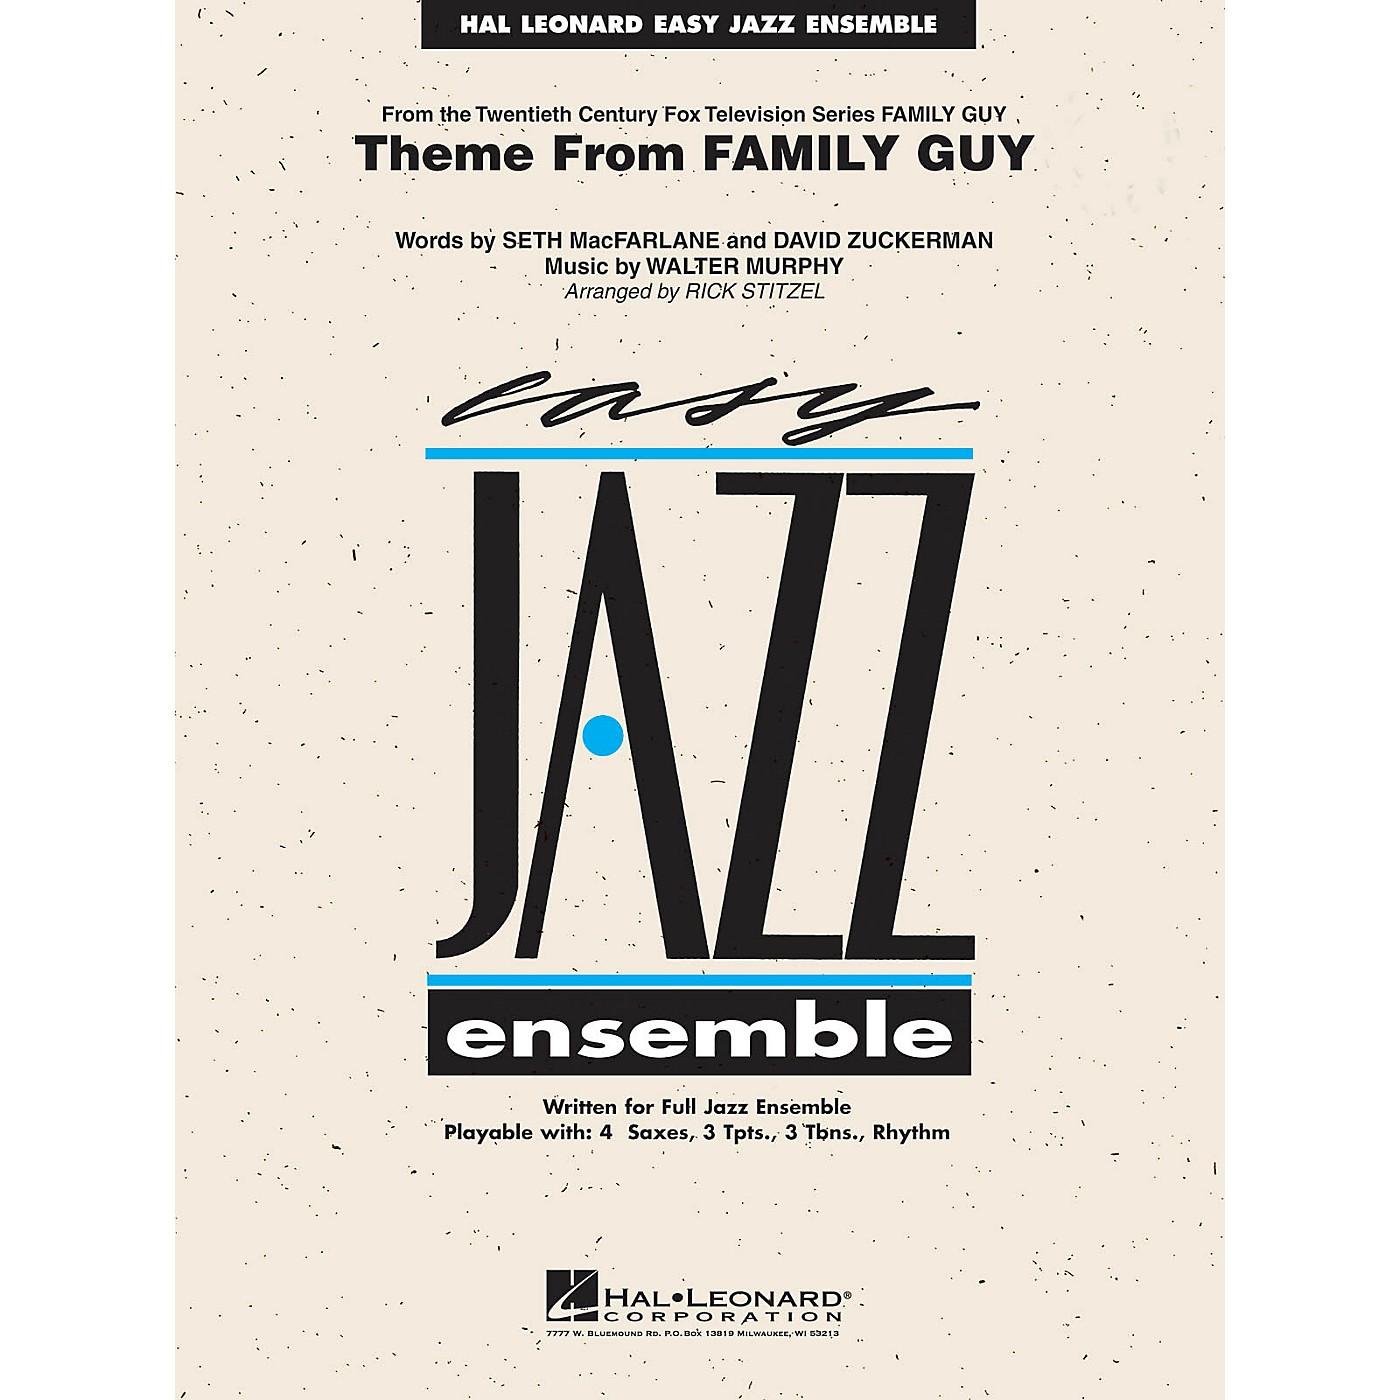 Hal Leonard Theme from Family Guy (Includes Full Performance CD) Jazz Band Level 2 Arranged by Rick Stitzel thumbnail